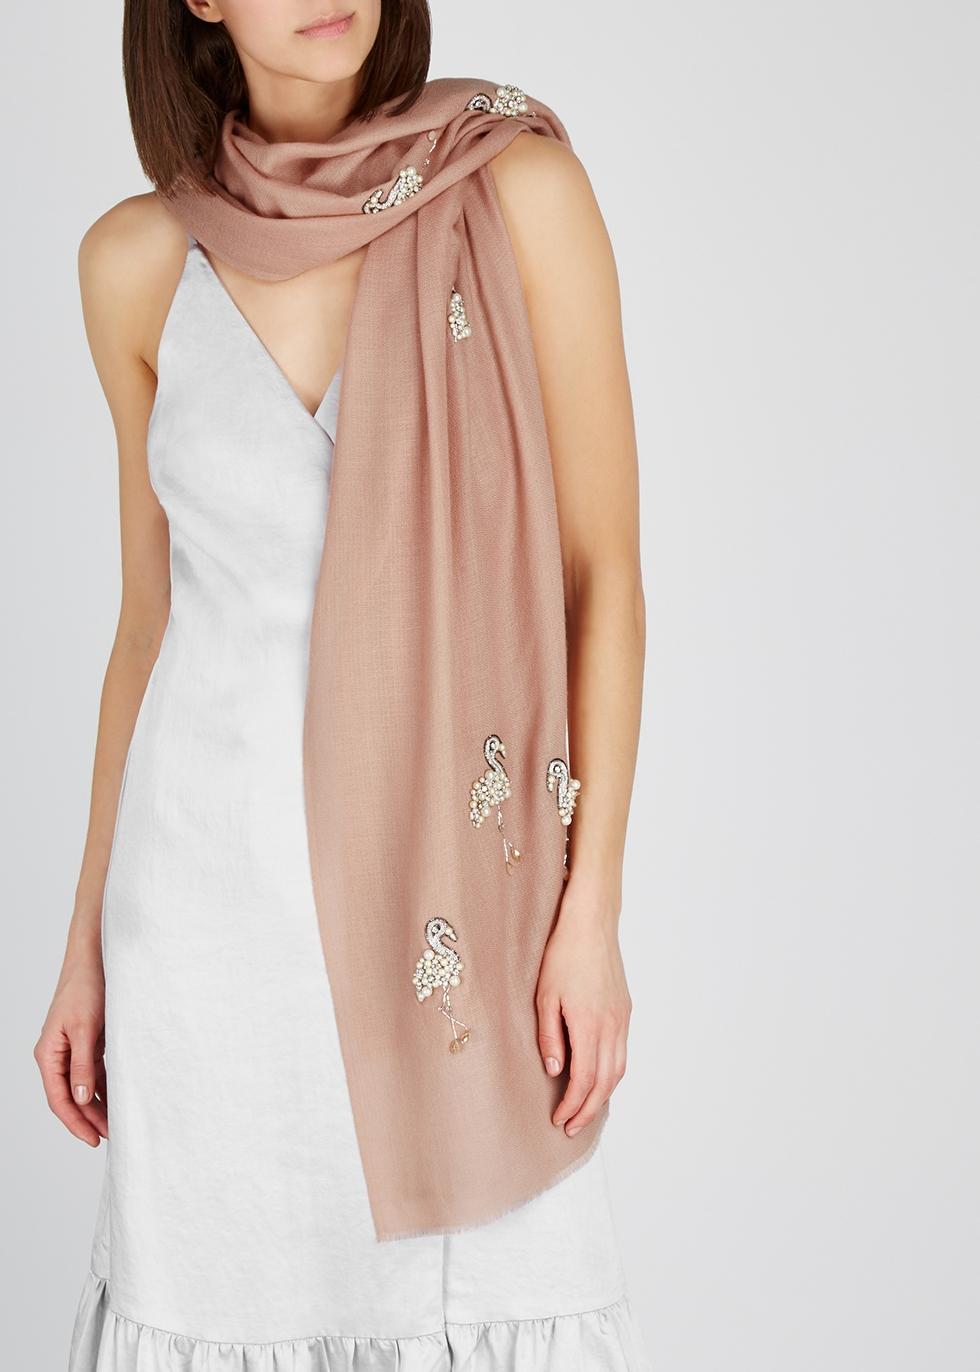 Dusky pink embellished cashmere scarf - Janavi